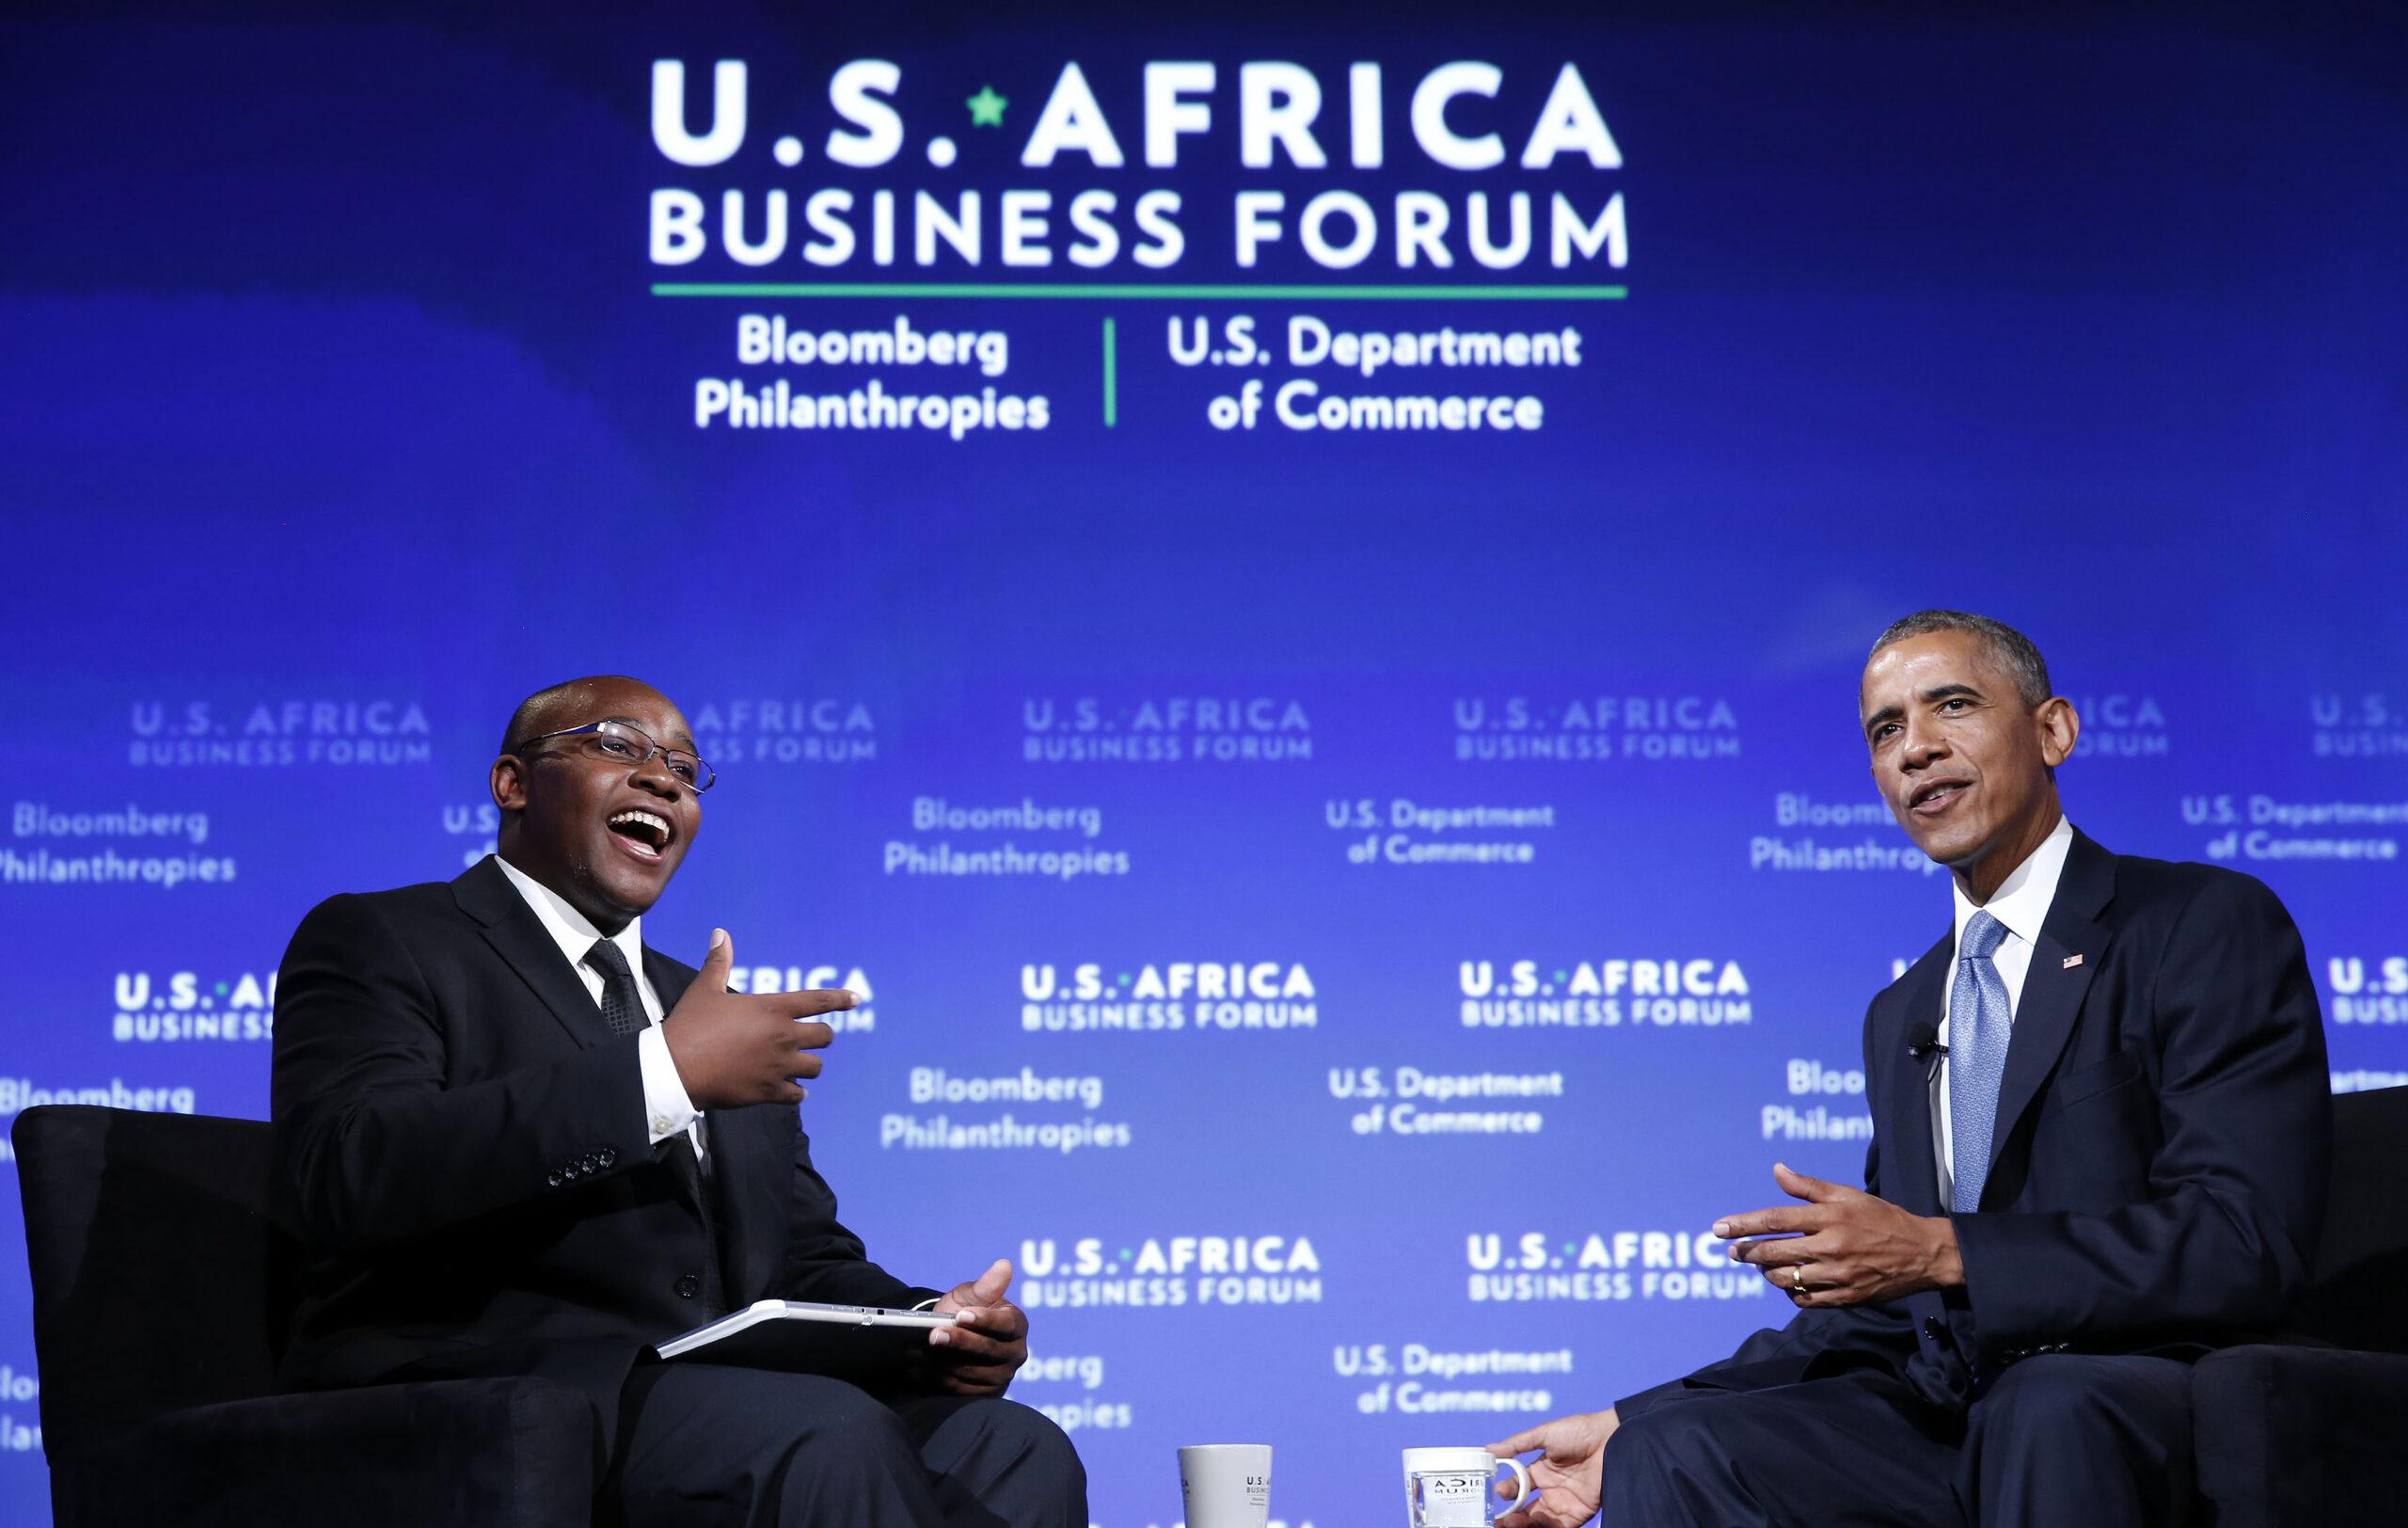 U.S. - Africa Business Forum - Investors King